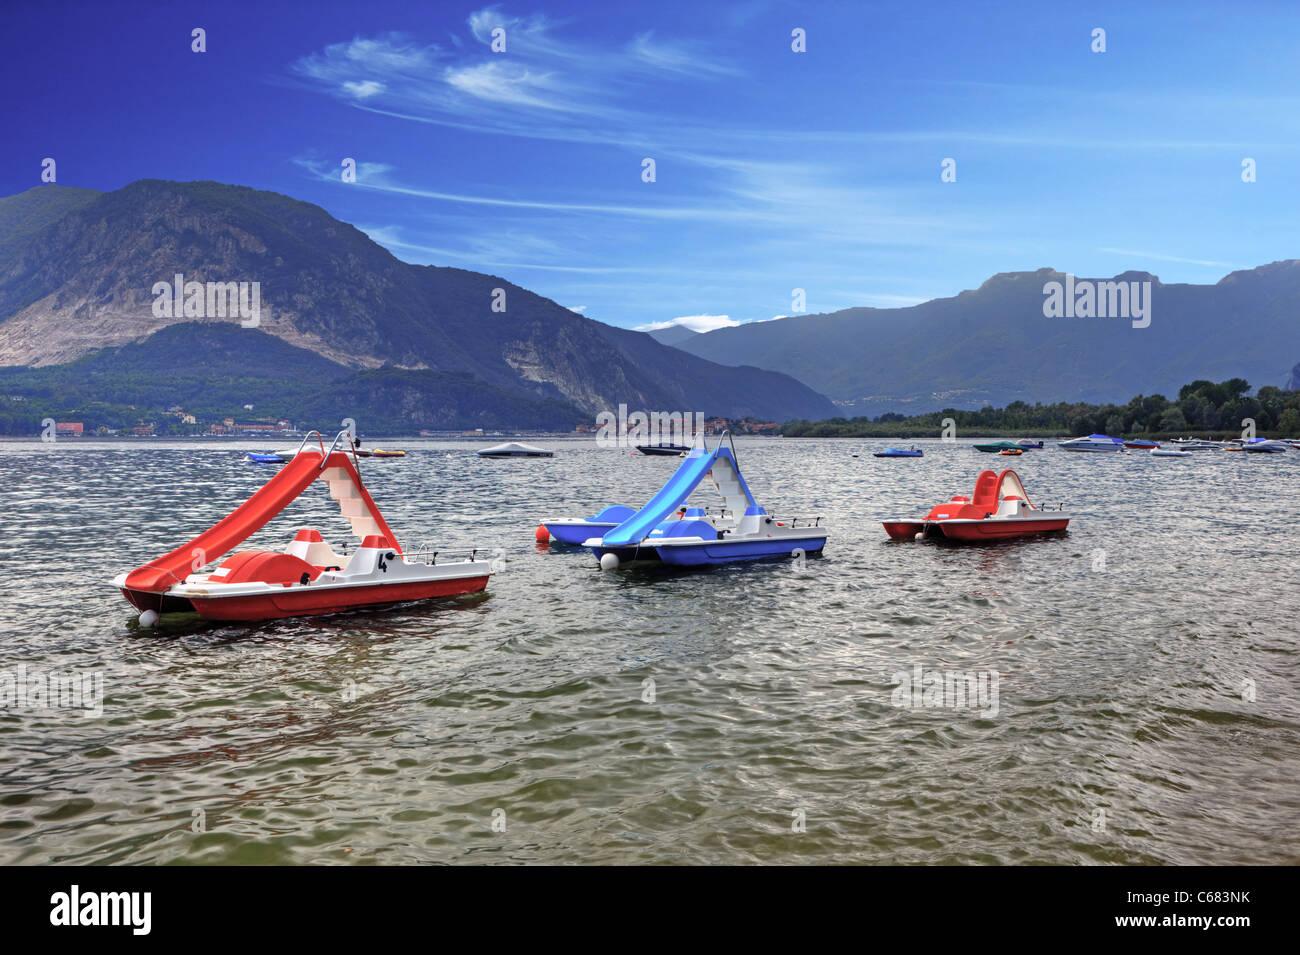 three pedal boats on Lake Maggiore - Stock Image